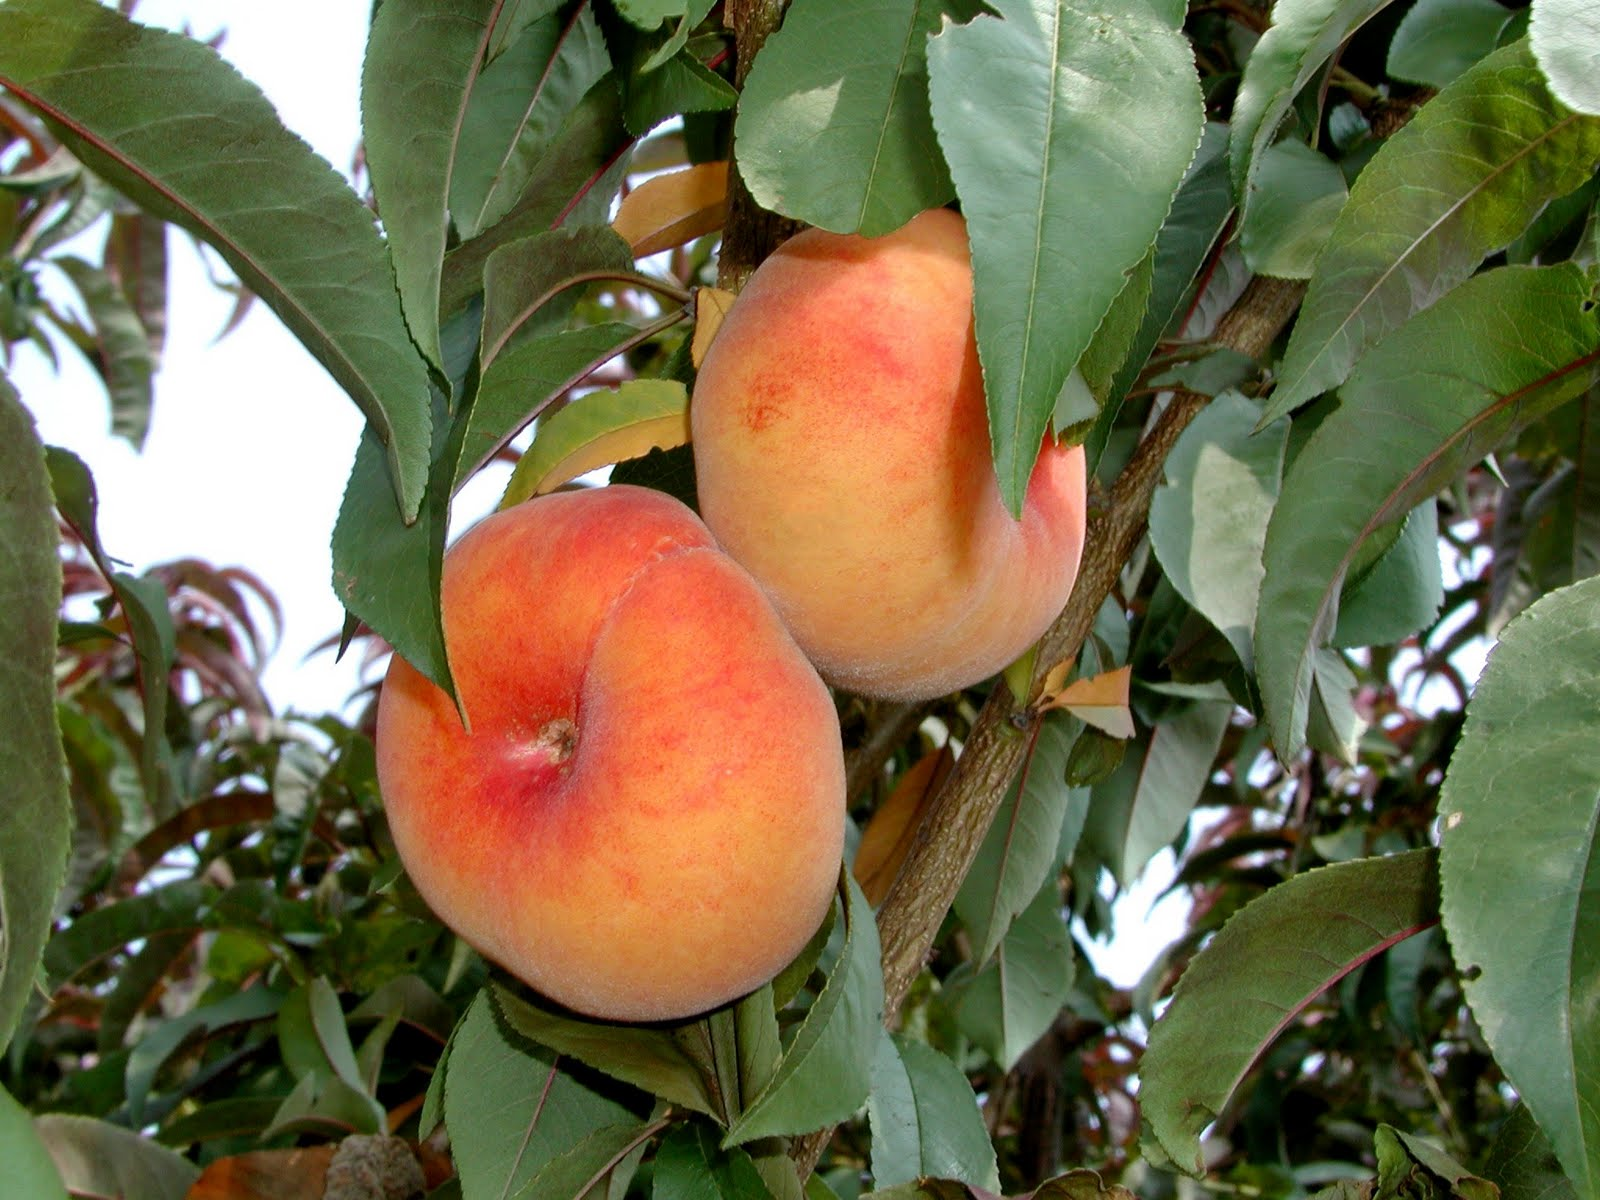 Fruits wallpapers for desktop background free hd desktop for Fruit trees